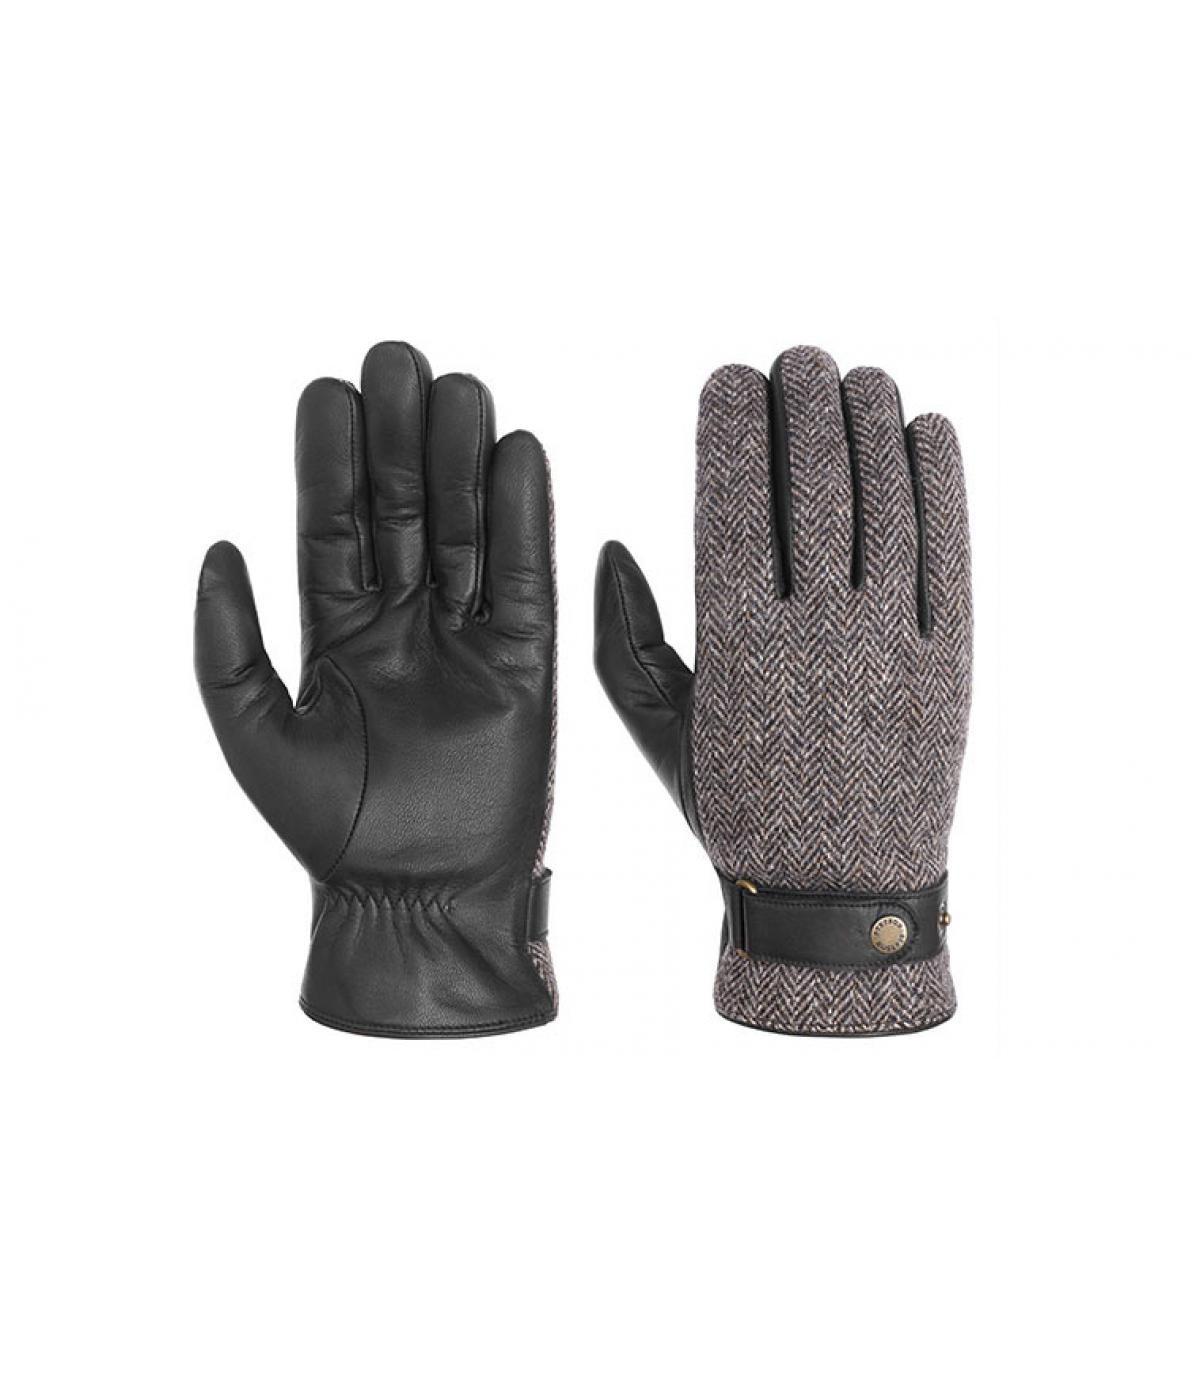 gants cuir et tweed Stetson